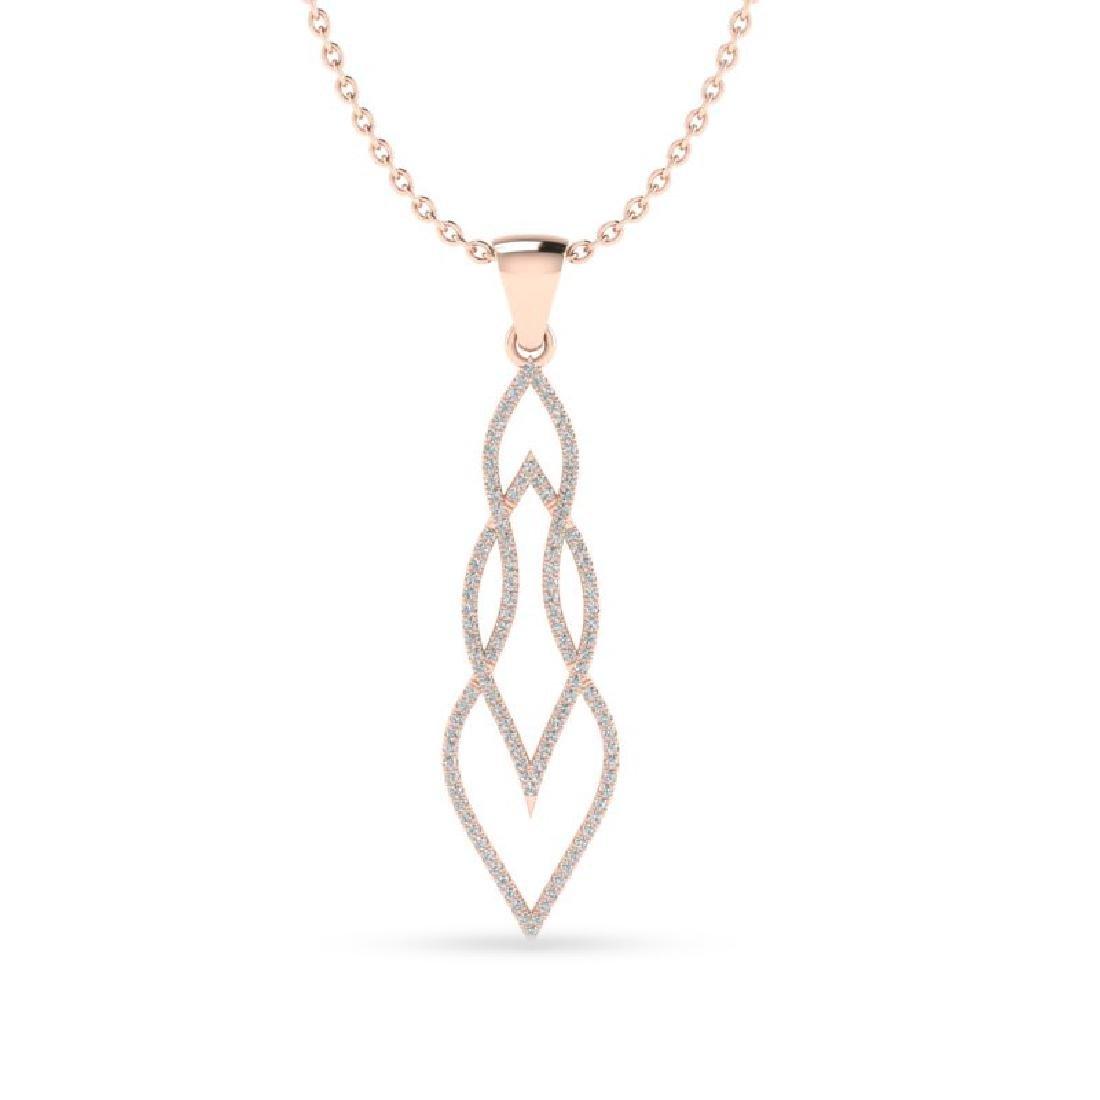 0.80 CTW Micro Pave VS/SI Diamond Necklace 14K Rose